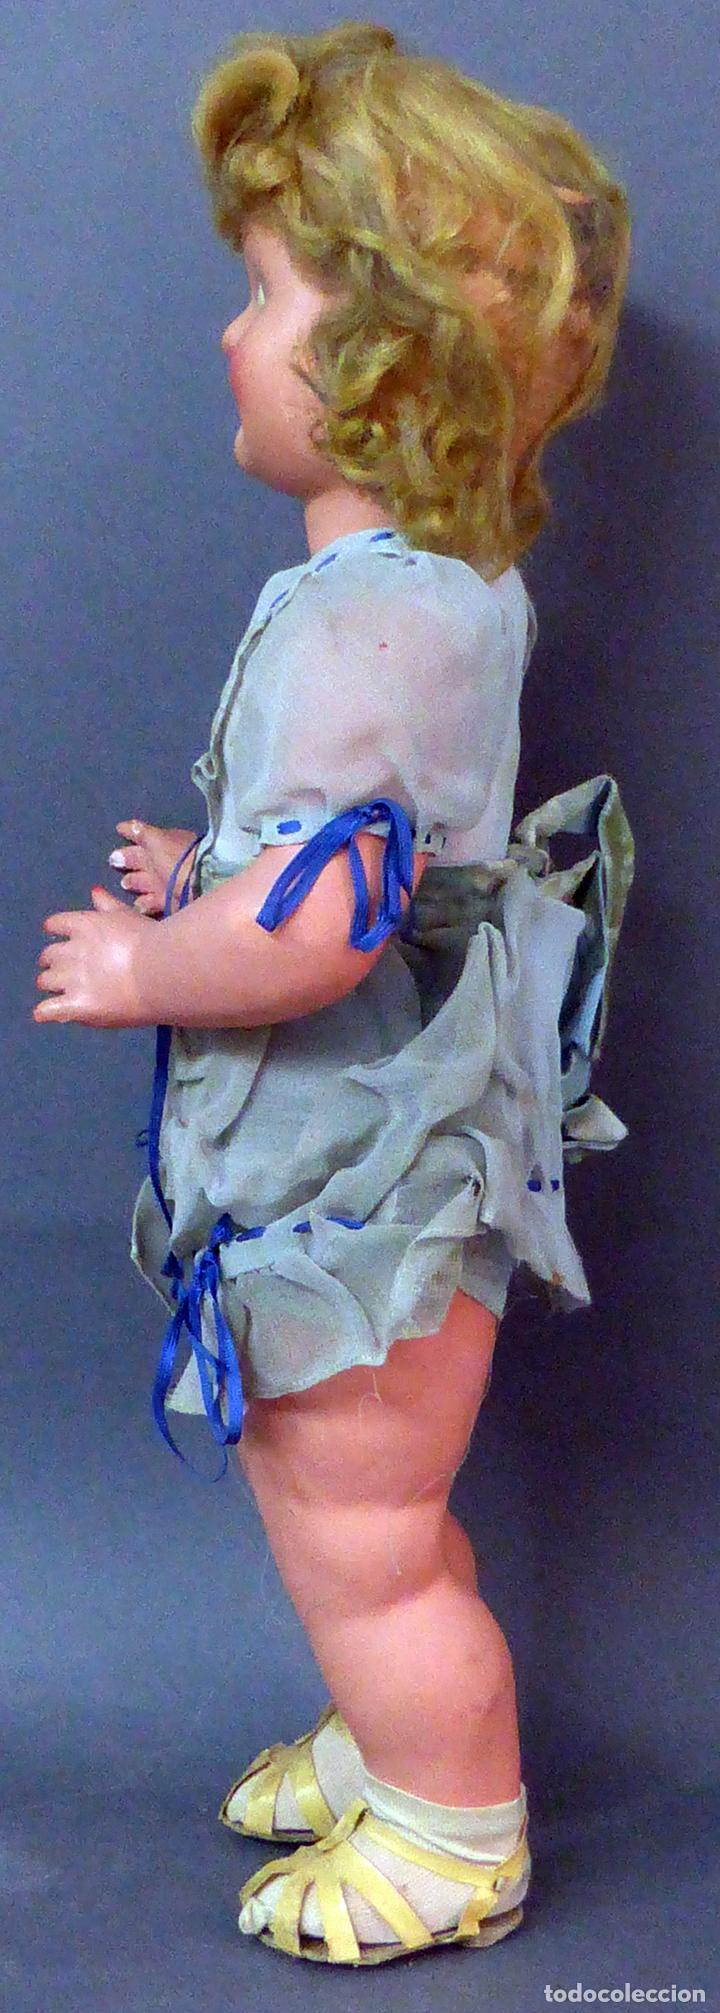 Muñeca española clasica: Muñeca popular cartón piedra cabeza celuloide ropa original peluca sandalias años 40 44 cm - Foto 3 - 102704747